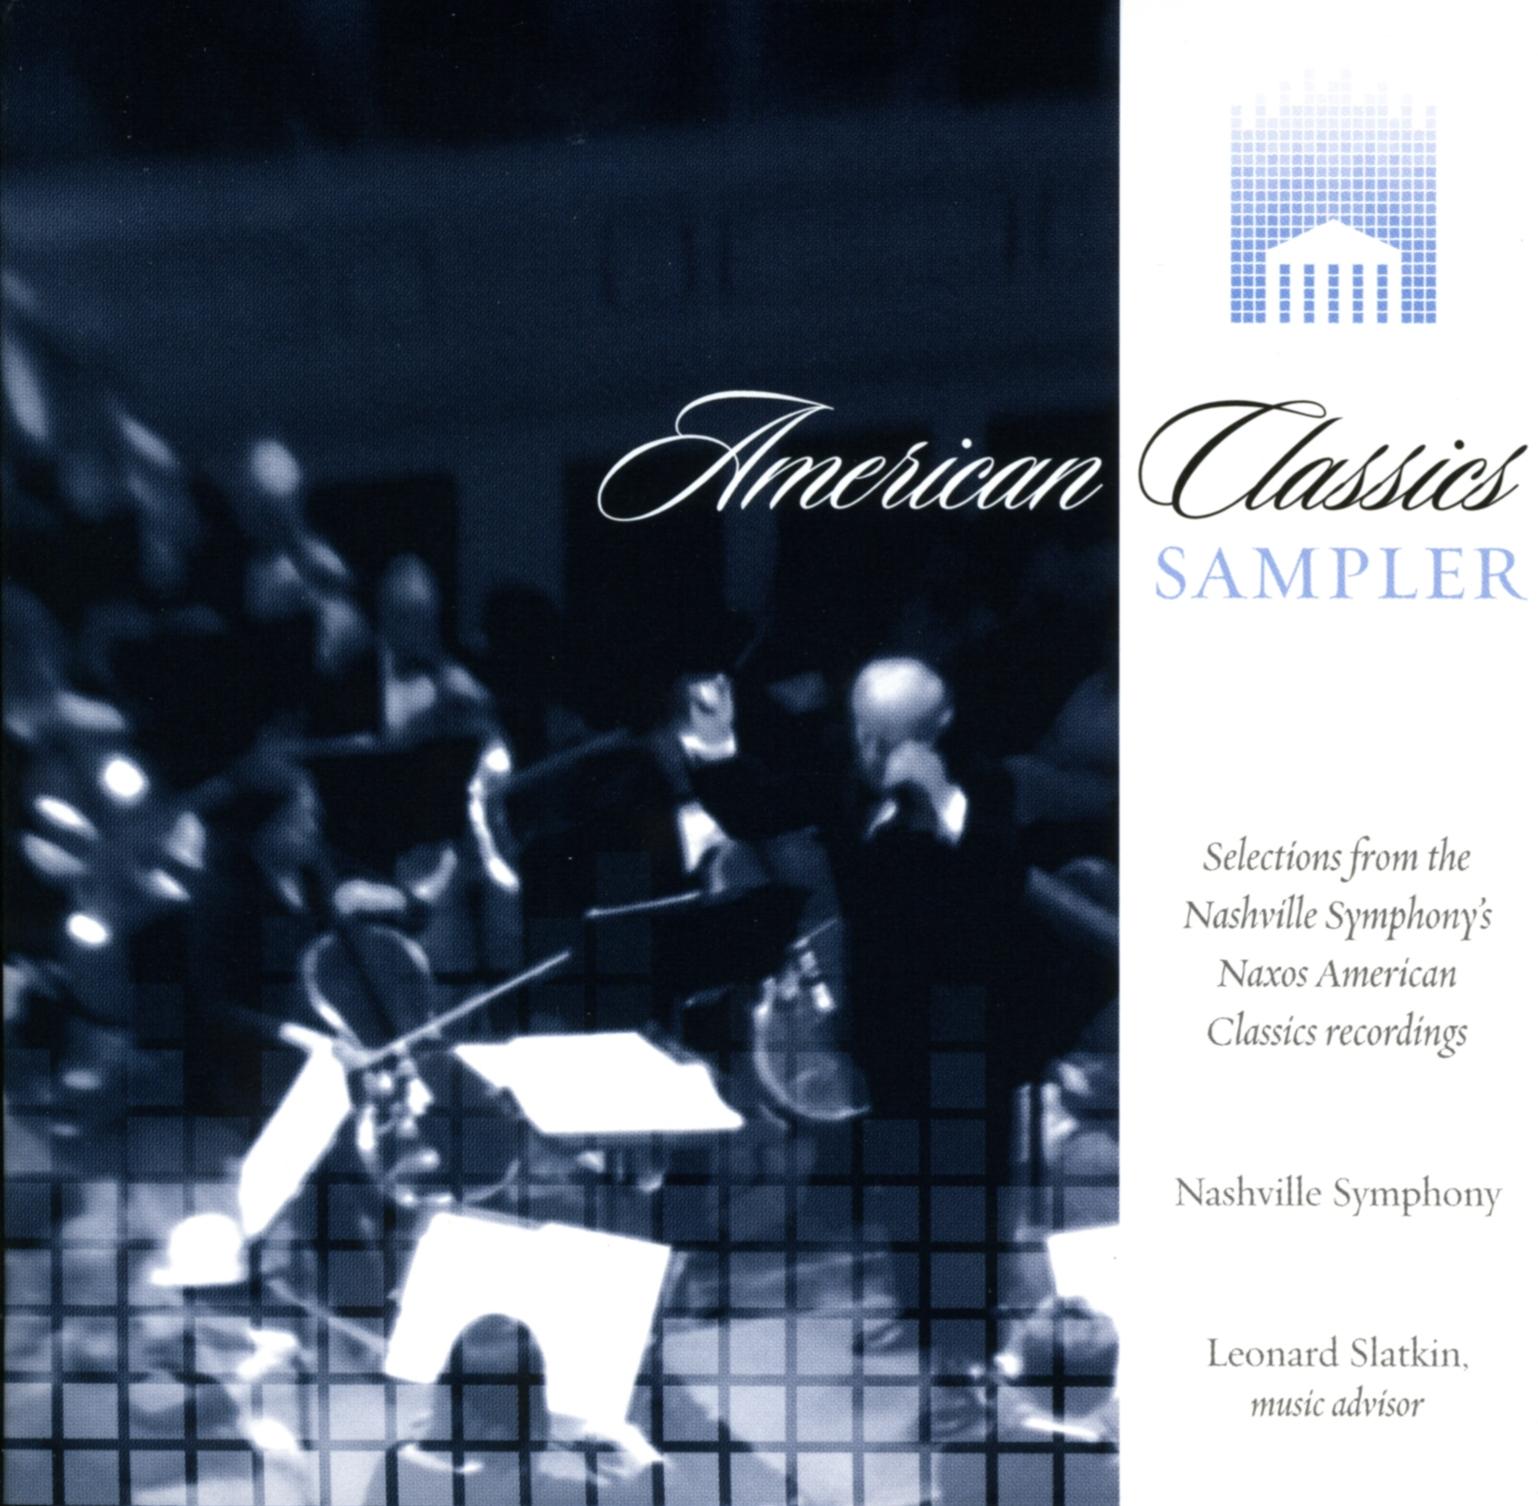 American Classics Sampler copy.jpg